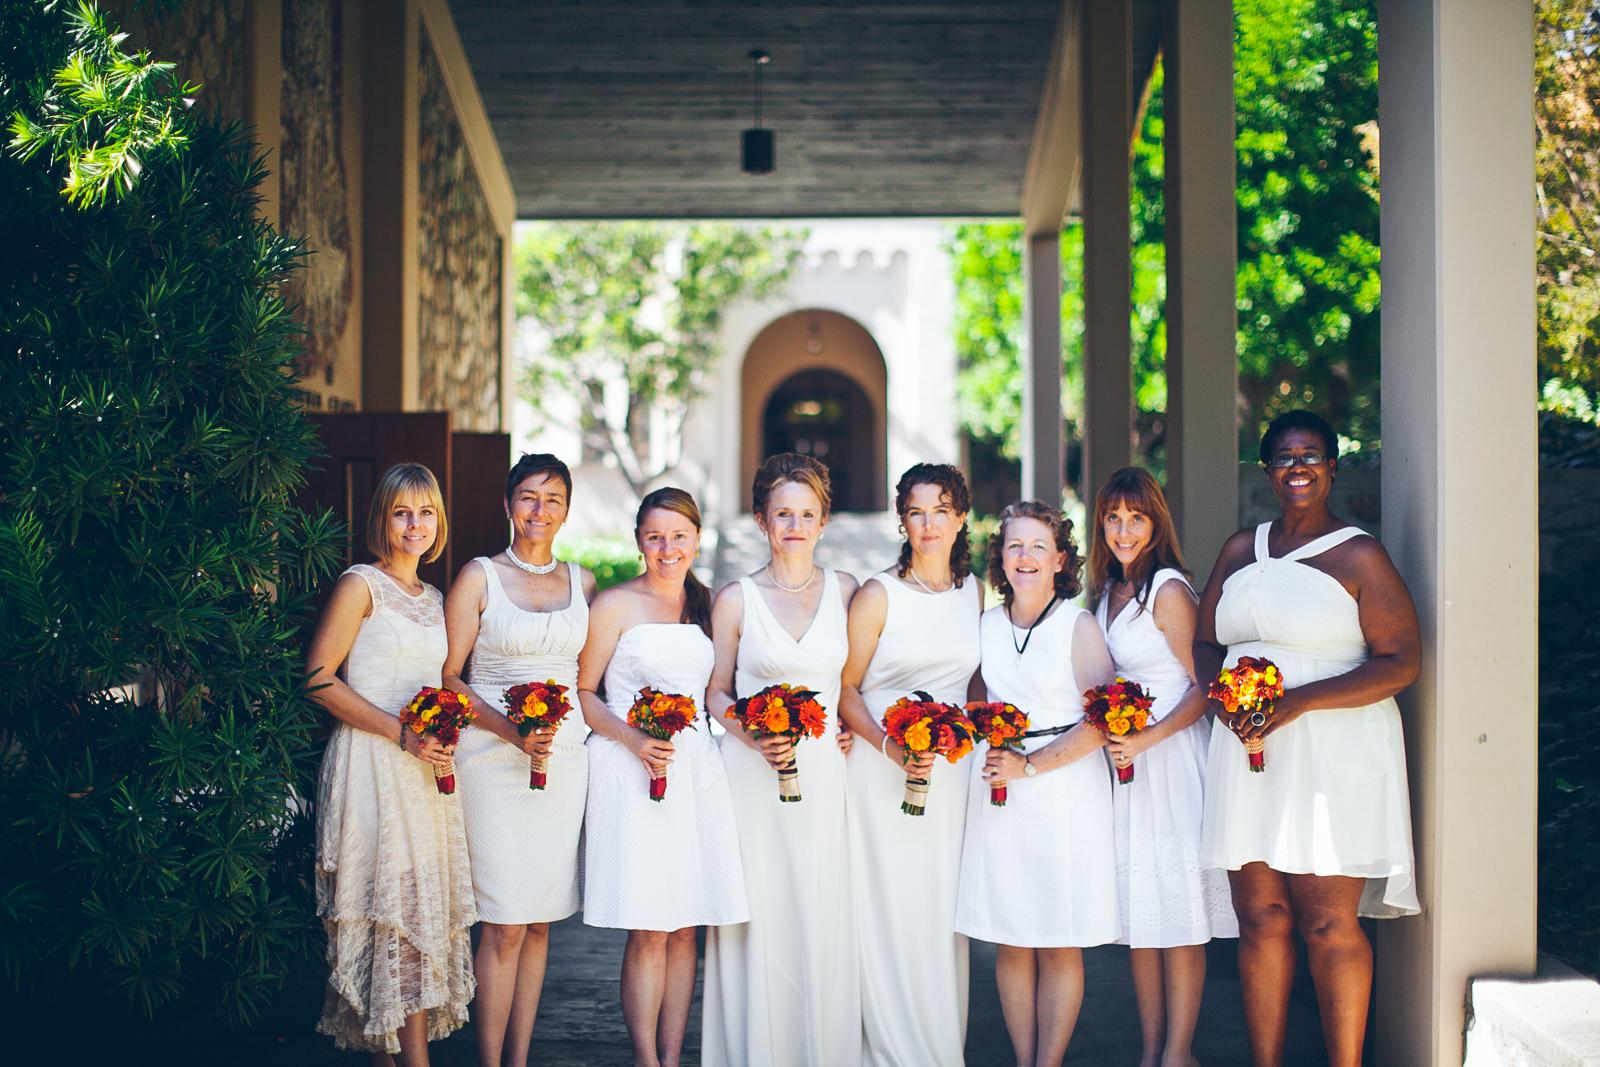 Riverside_ca_wedding_photography_marguerite_carolyn_ebony_siovhan_bokeh_photography_42.jpg